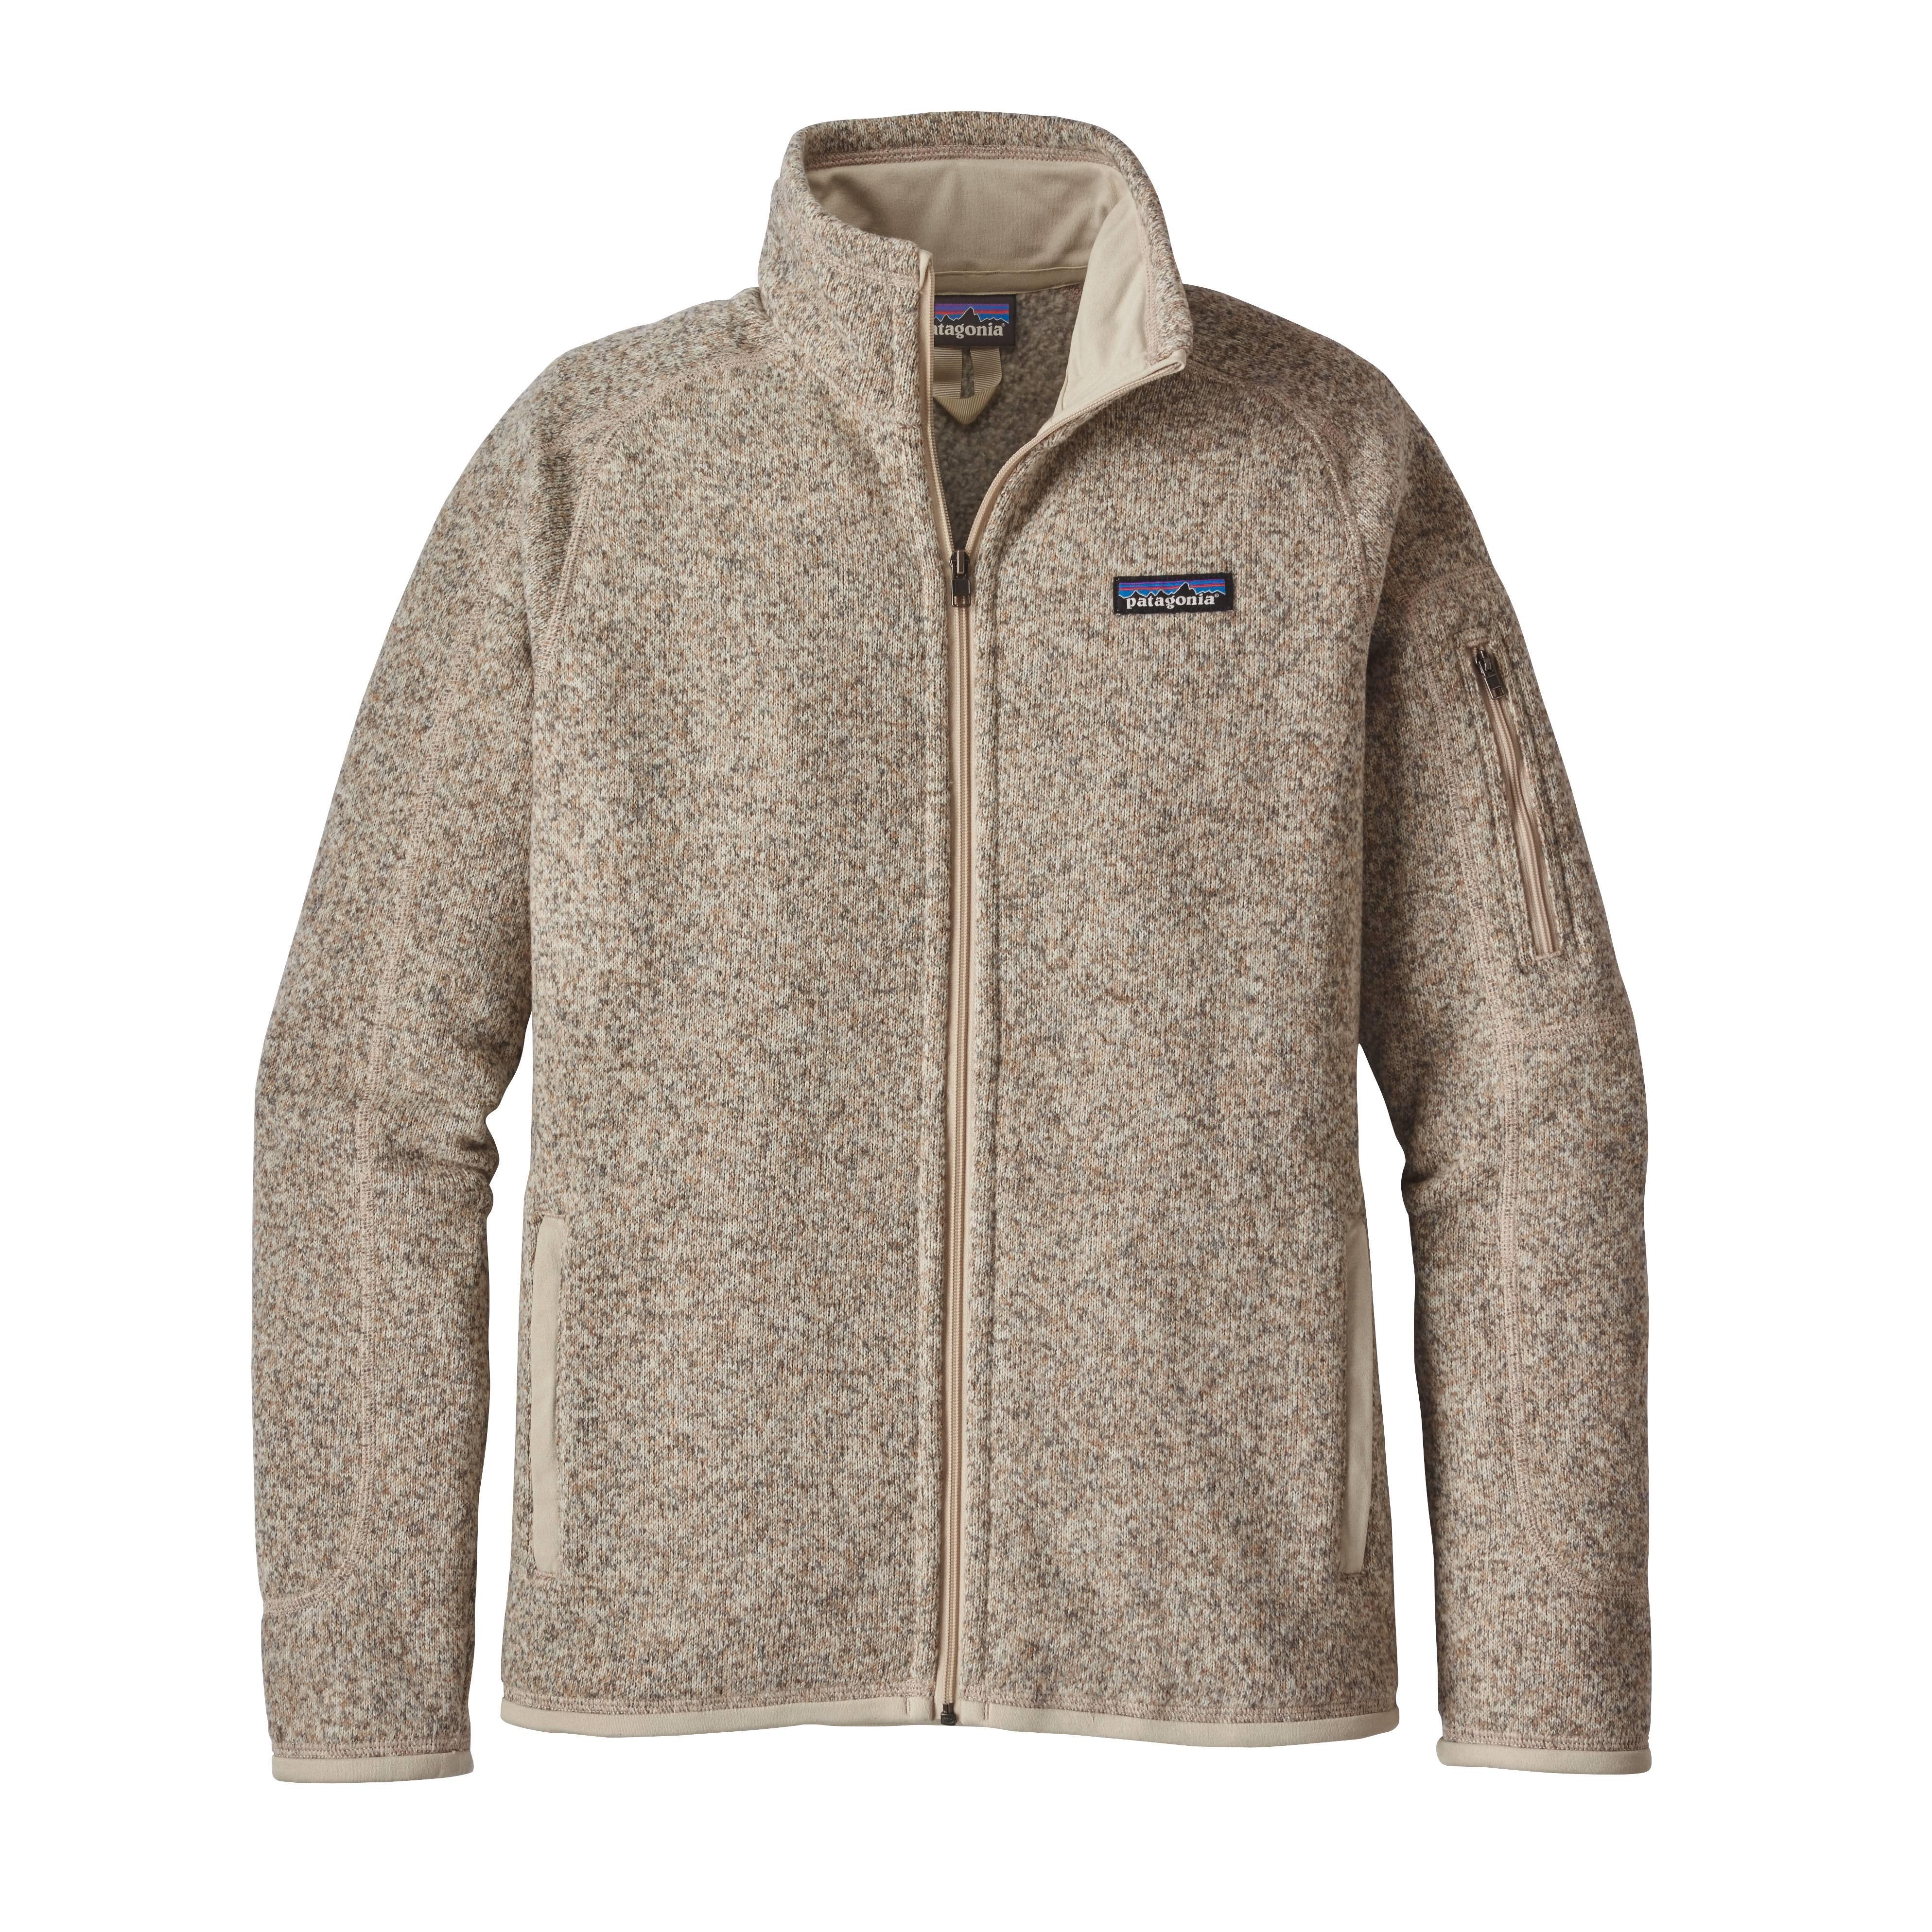 plcn 25542 Patagonia Better S Sweater Jacket W 7OTX0v